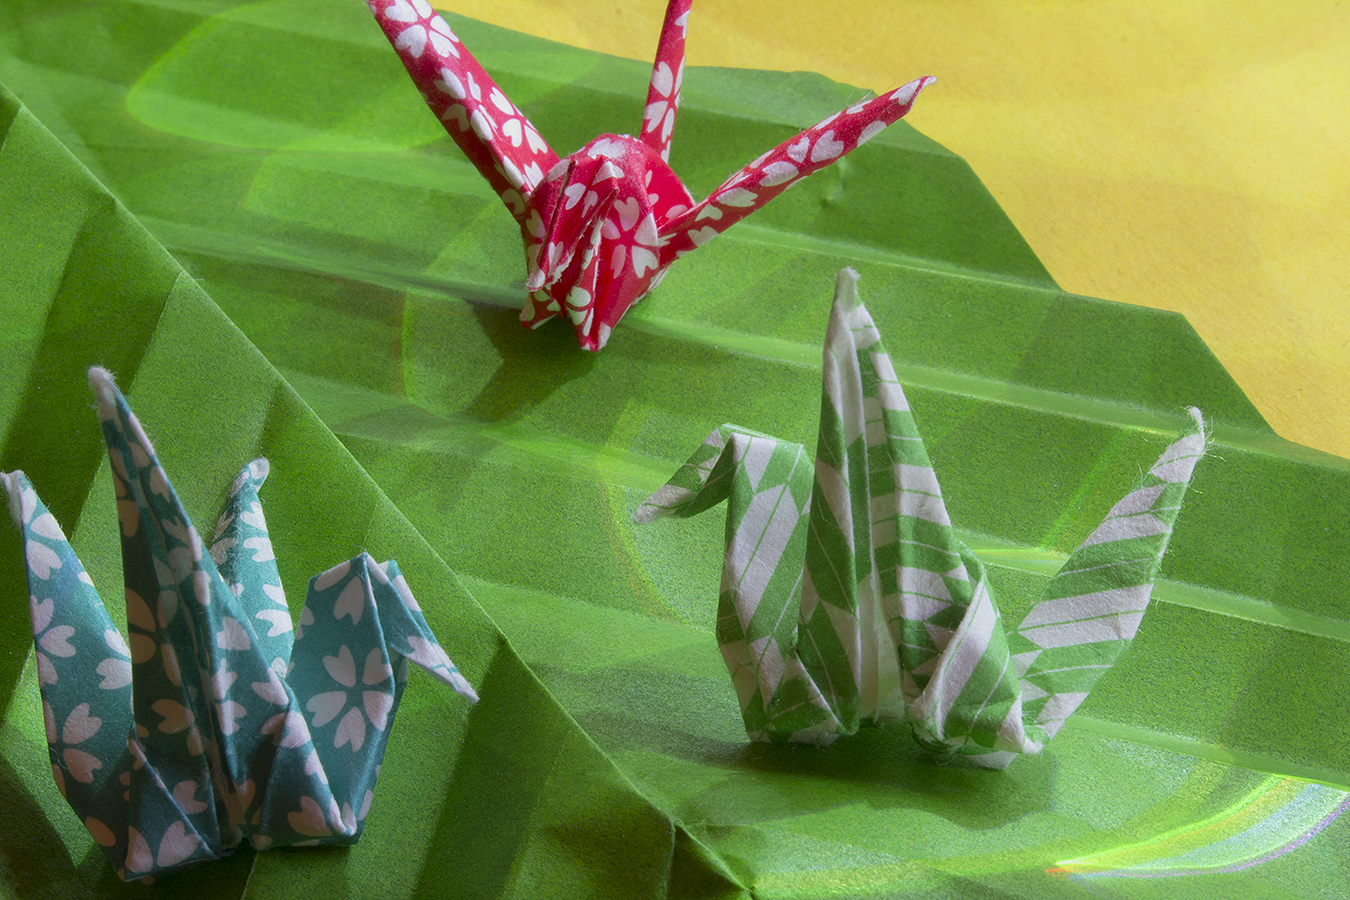 24_Birds_On_A_Leaf_Jonathan_Tang_UPenn_Tony_Ward_Studio_Long_Exposure_Low_Light_LED_Optics_Origami_Paper